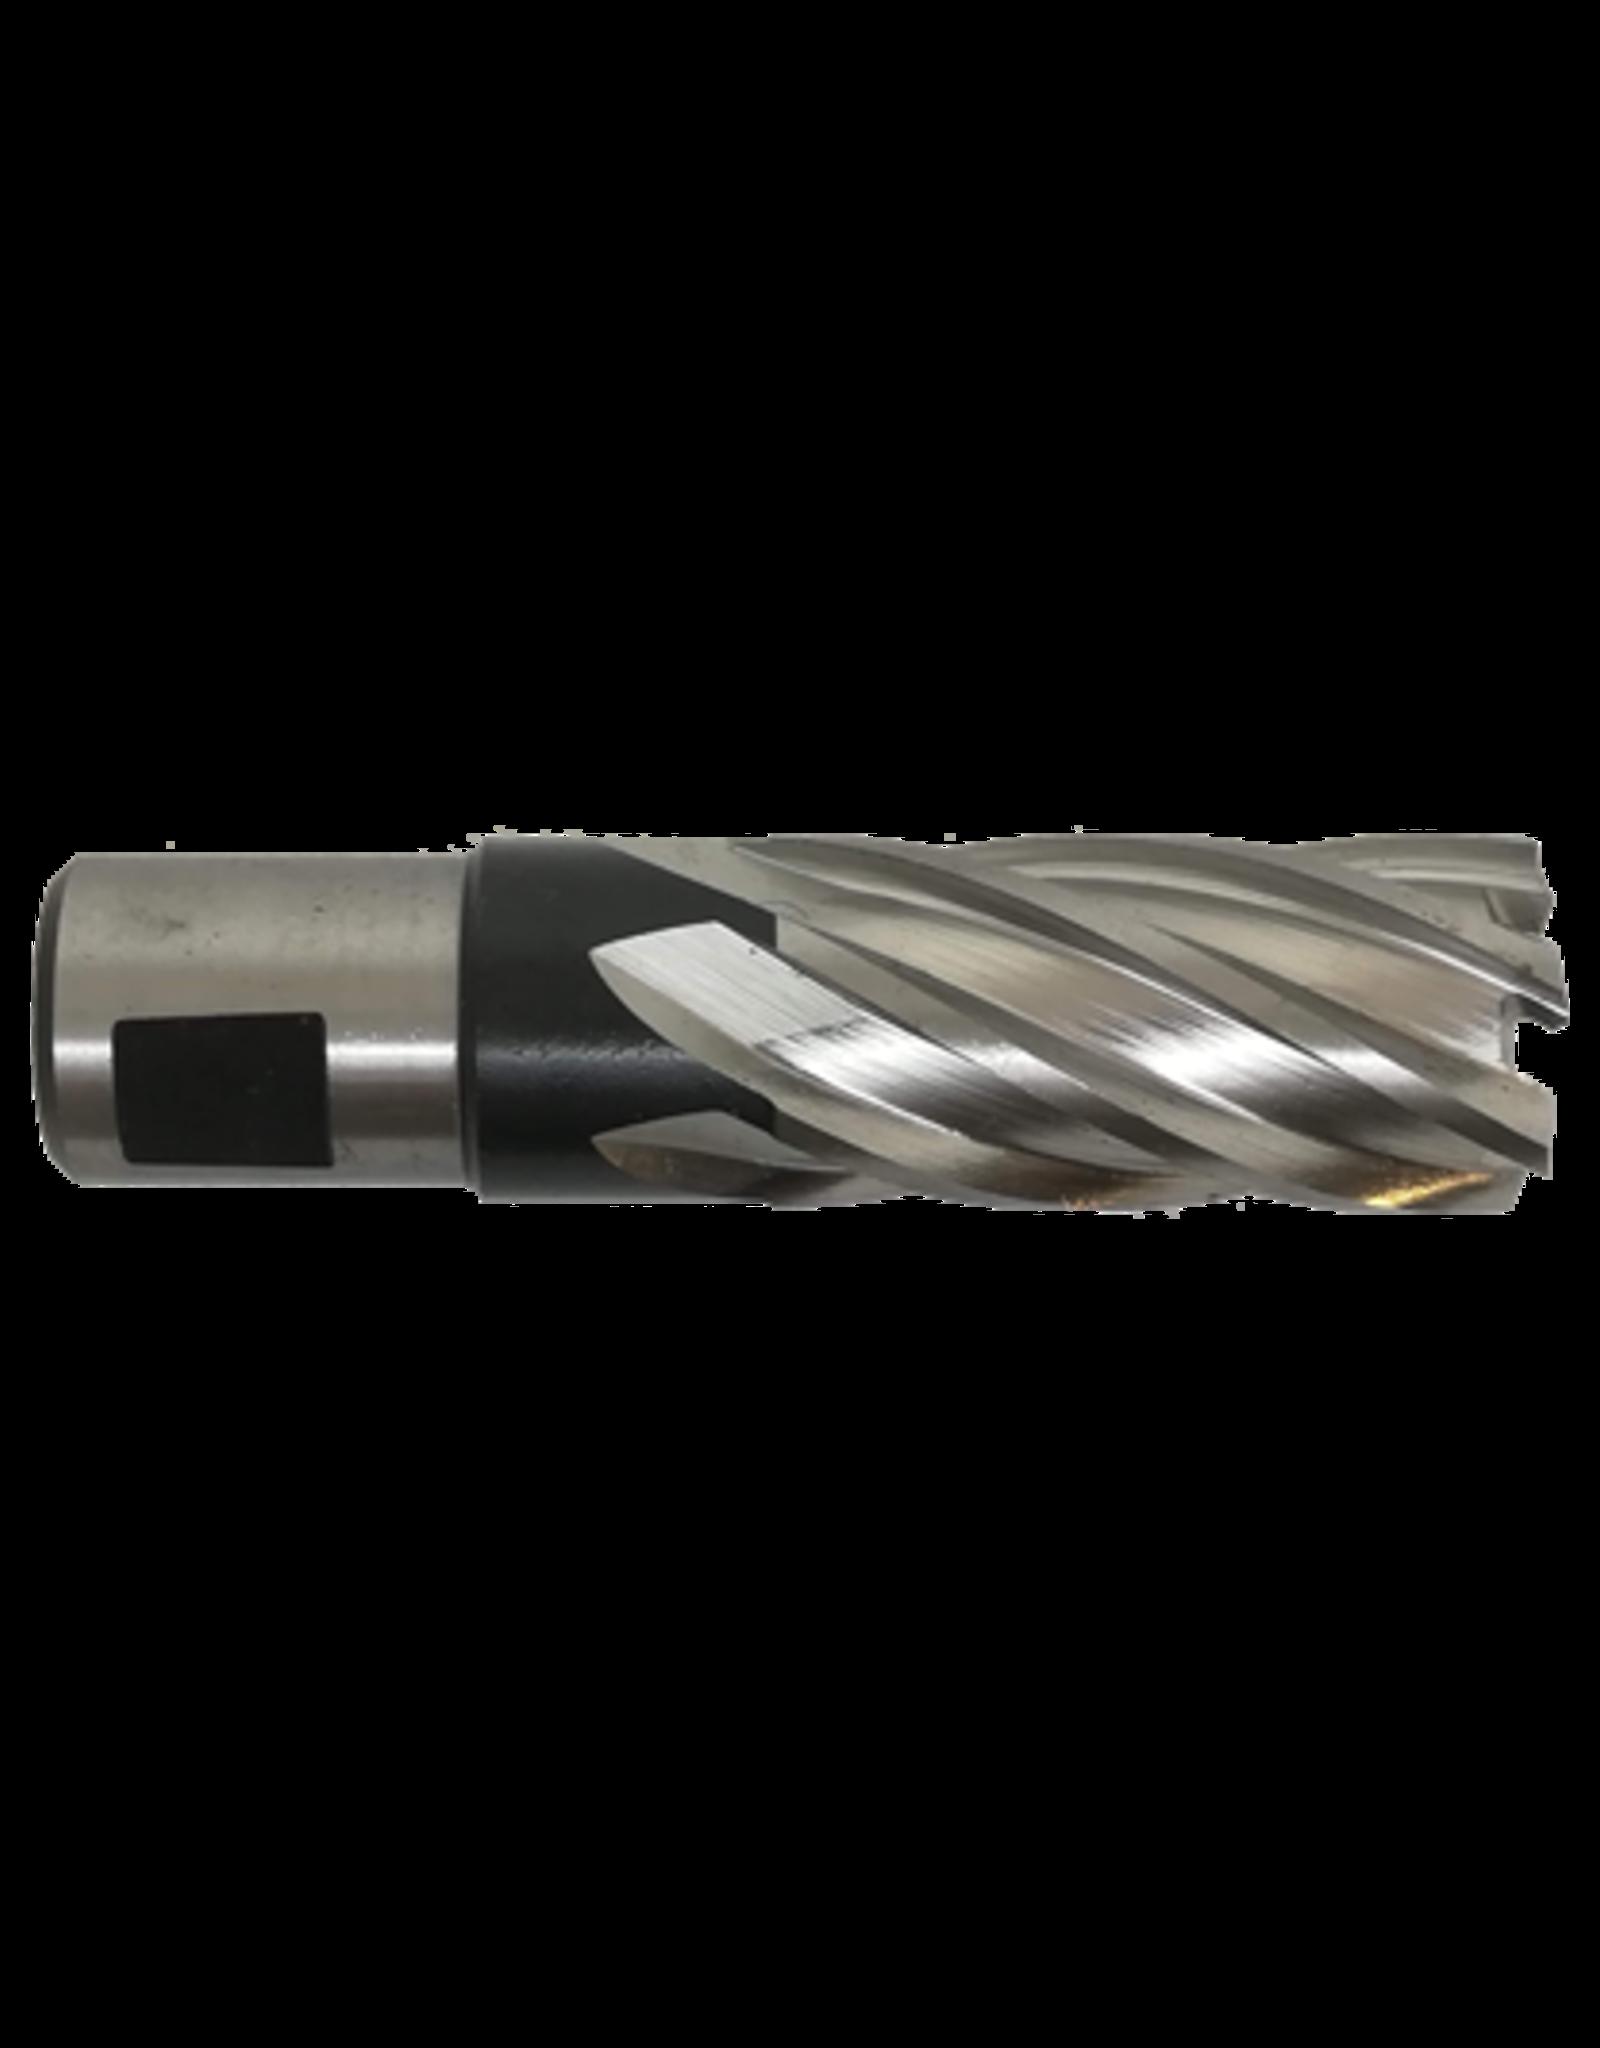 Evolution Power Tools Steel Line EVOLUTION CORE CUTTER LONG - 25 MM